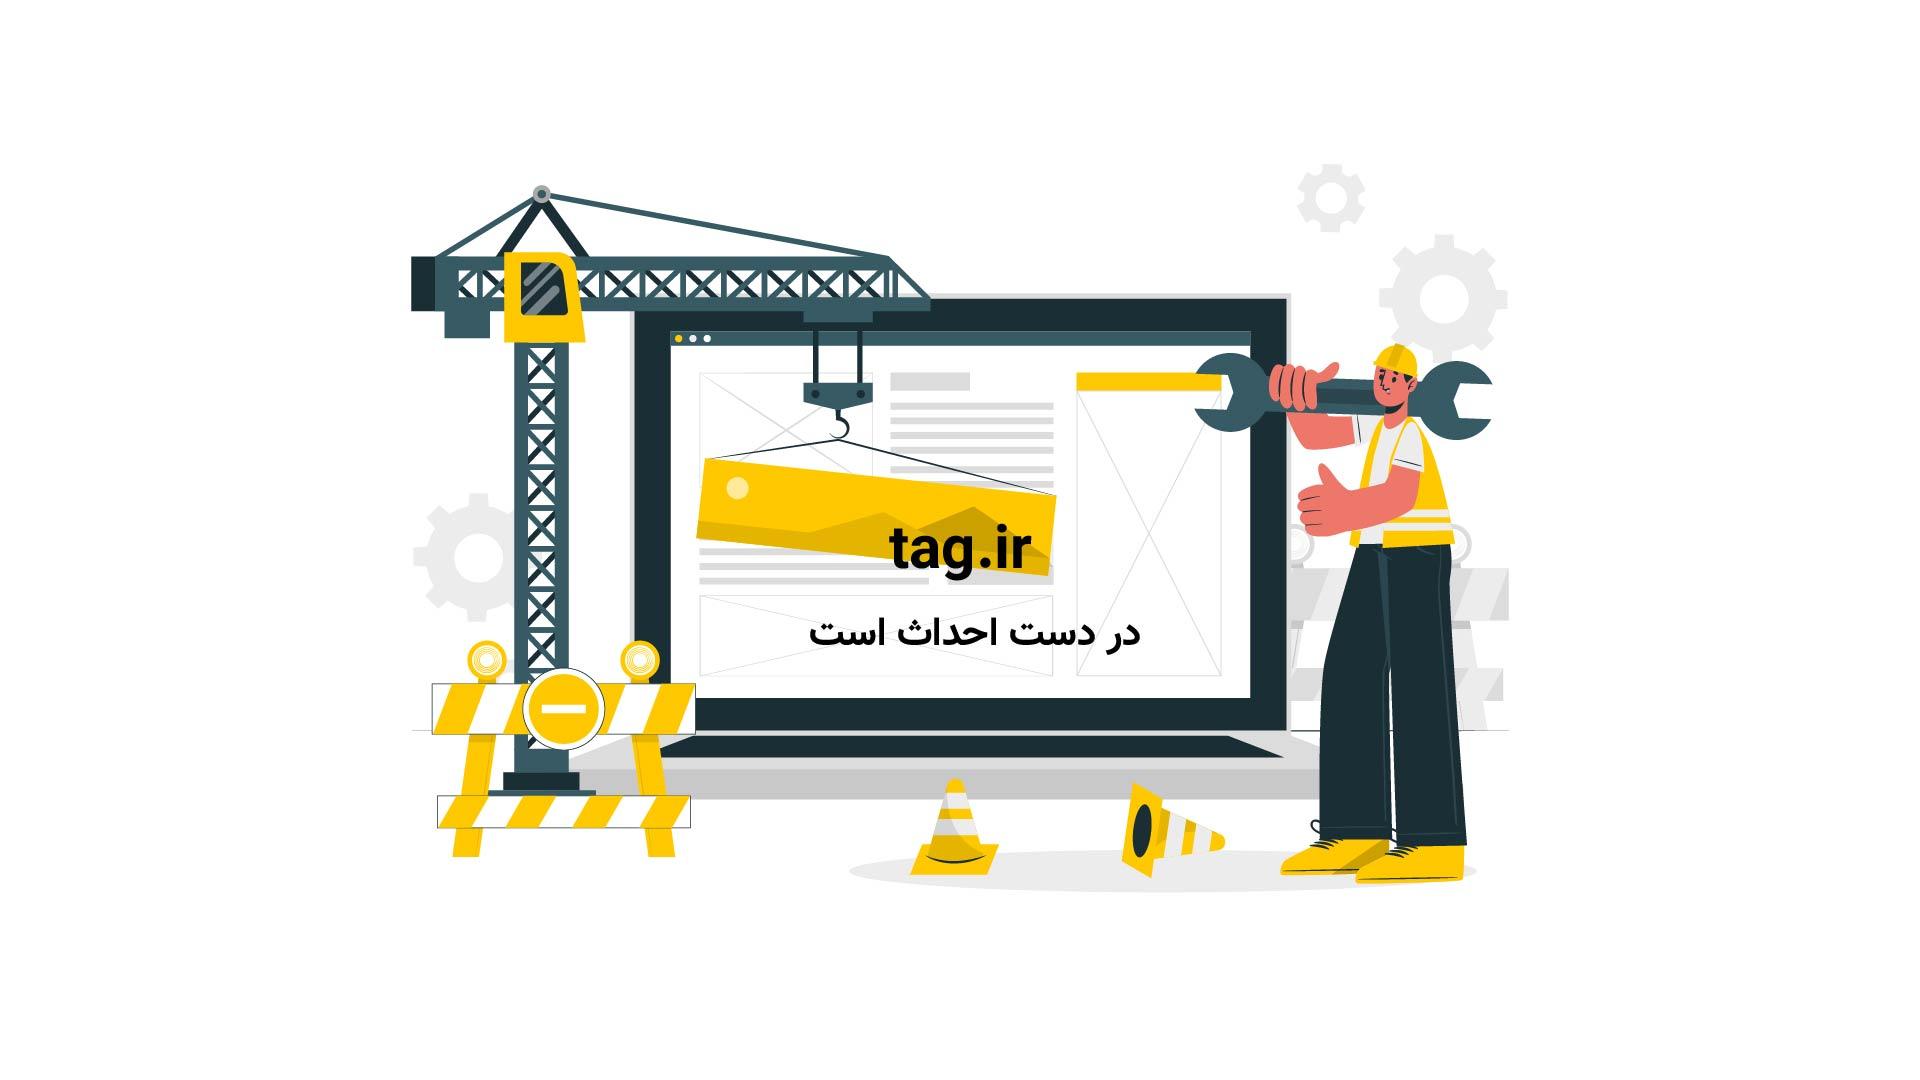 خلاصه بازی بسکتبال آتلانتا هاوکس ۹۴ – ۱۰۹ لس آنجلس لیکرز | فیلم